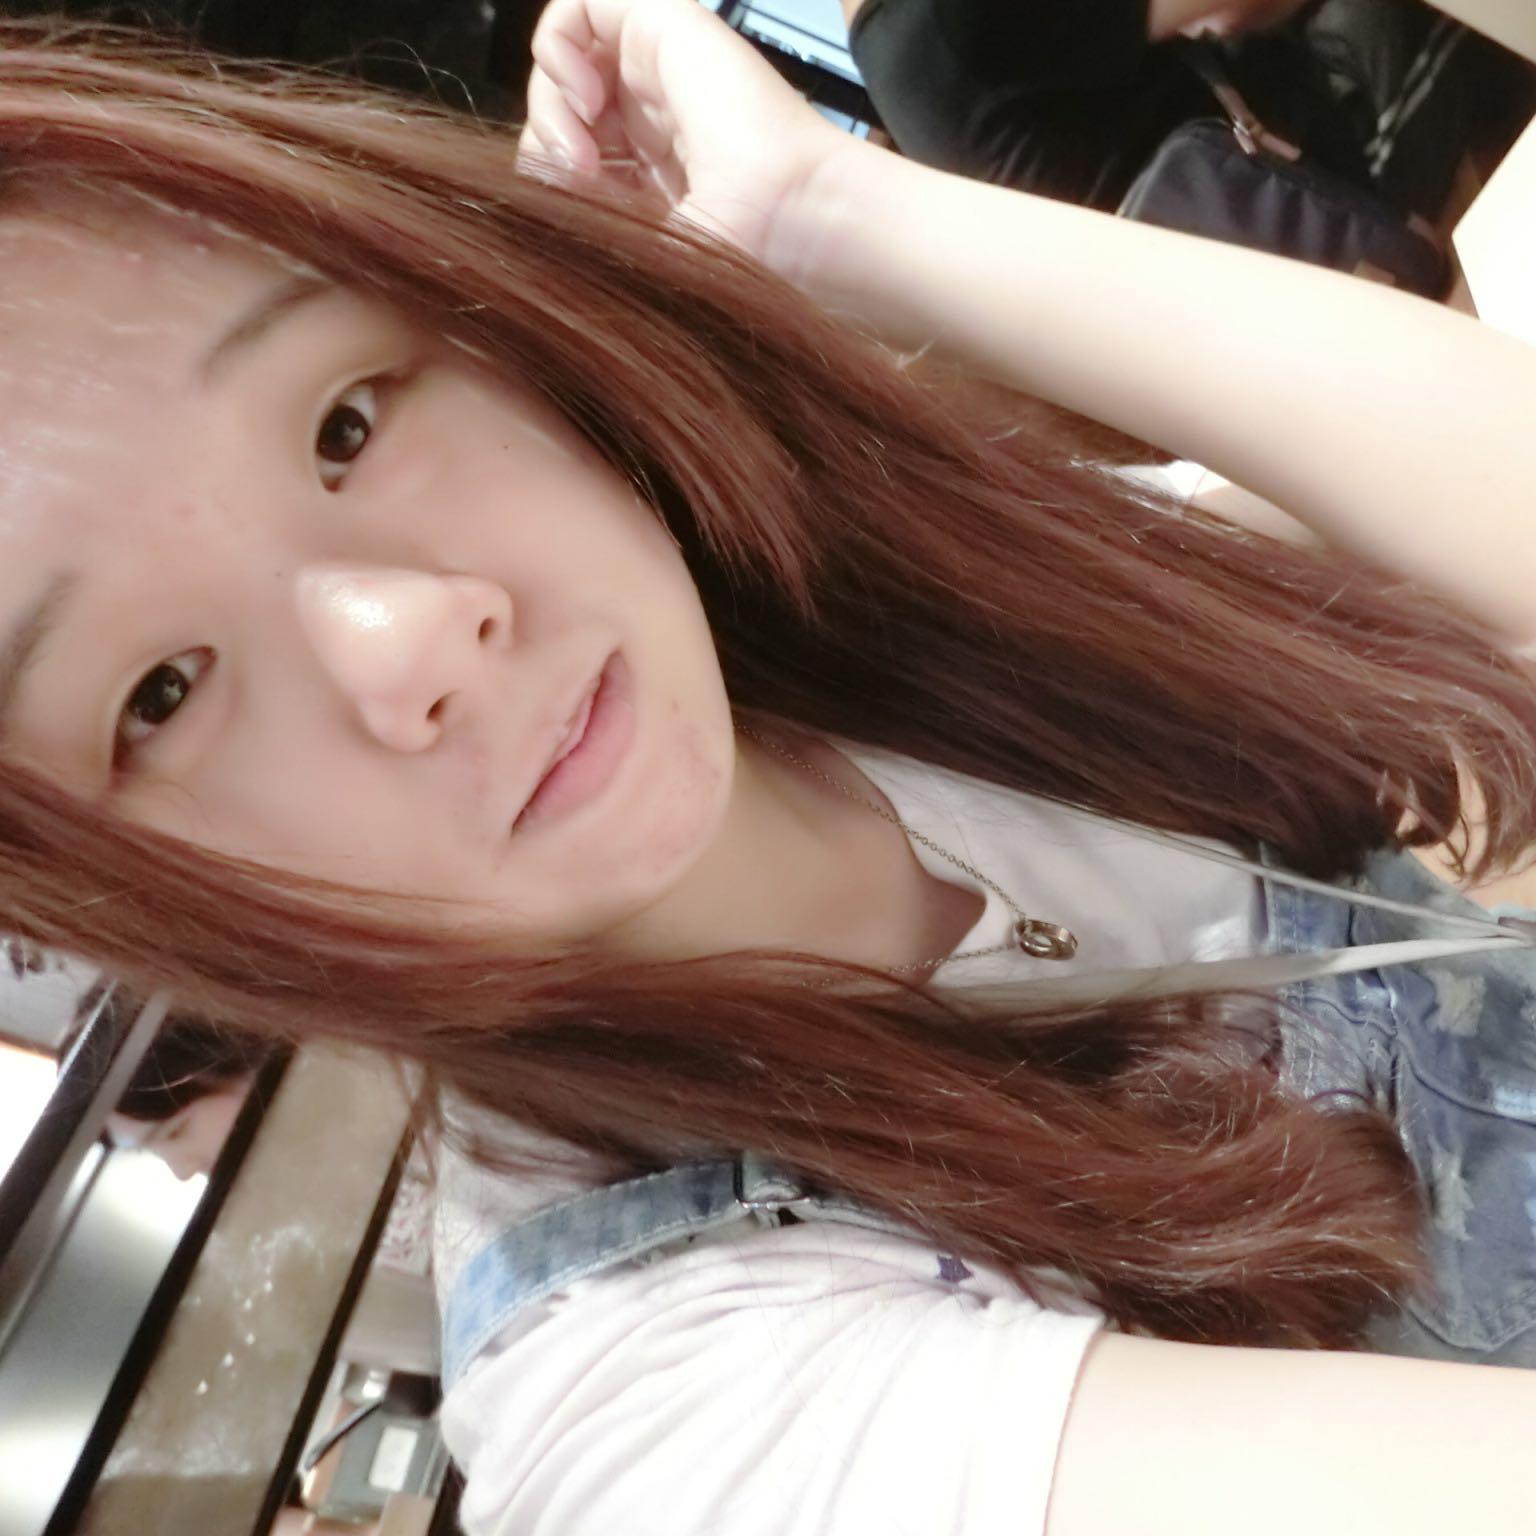 hanhan521